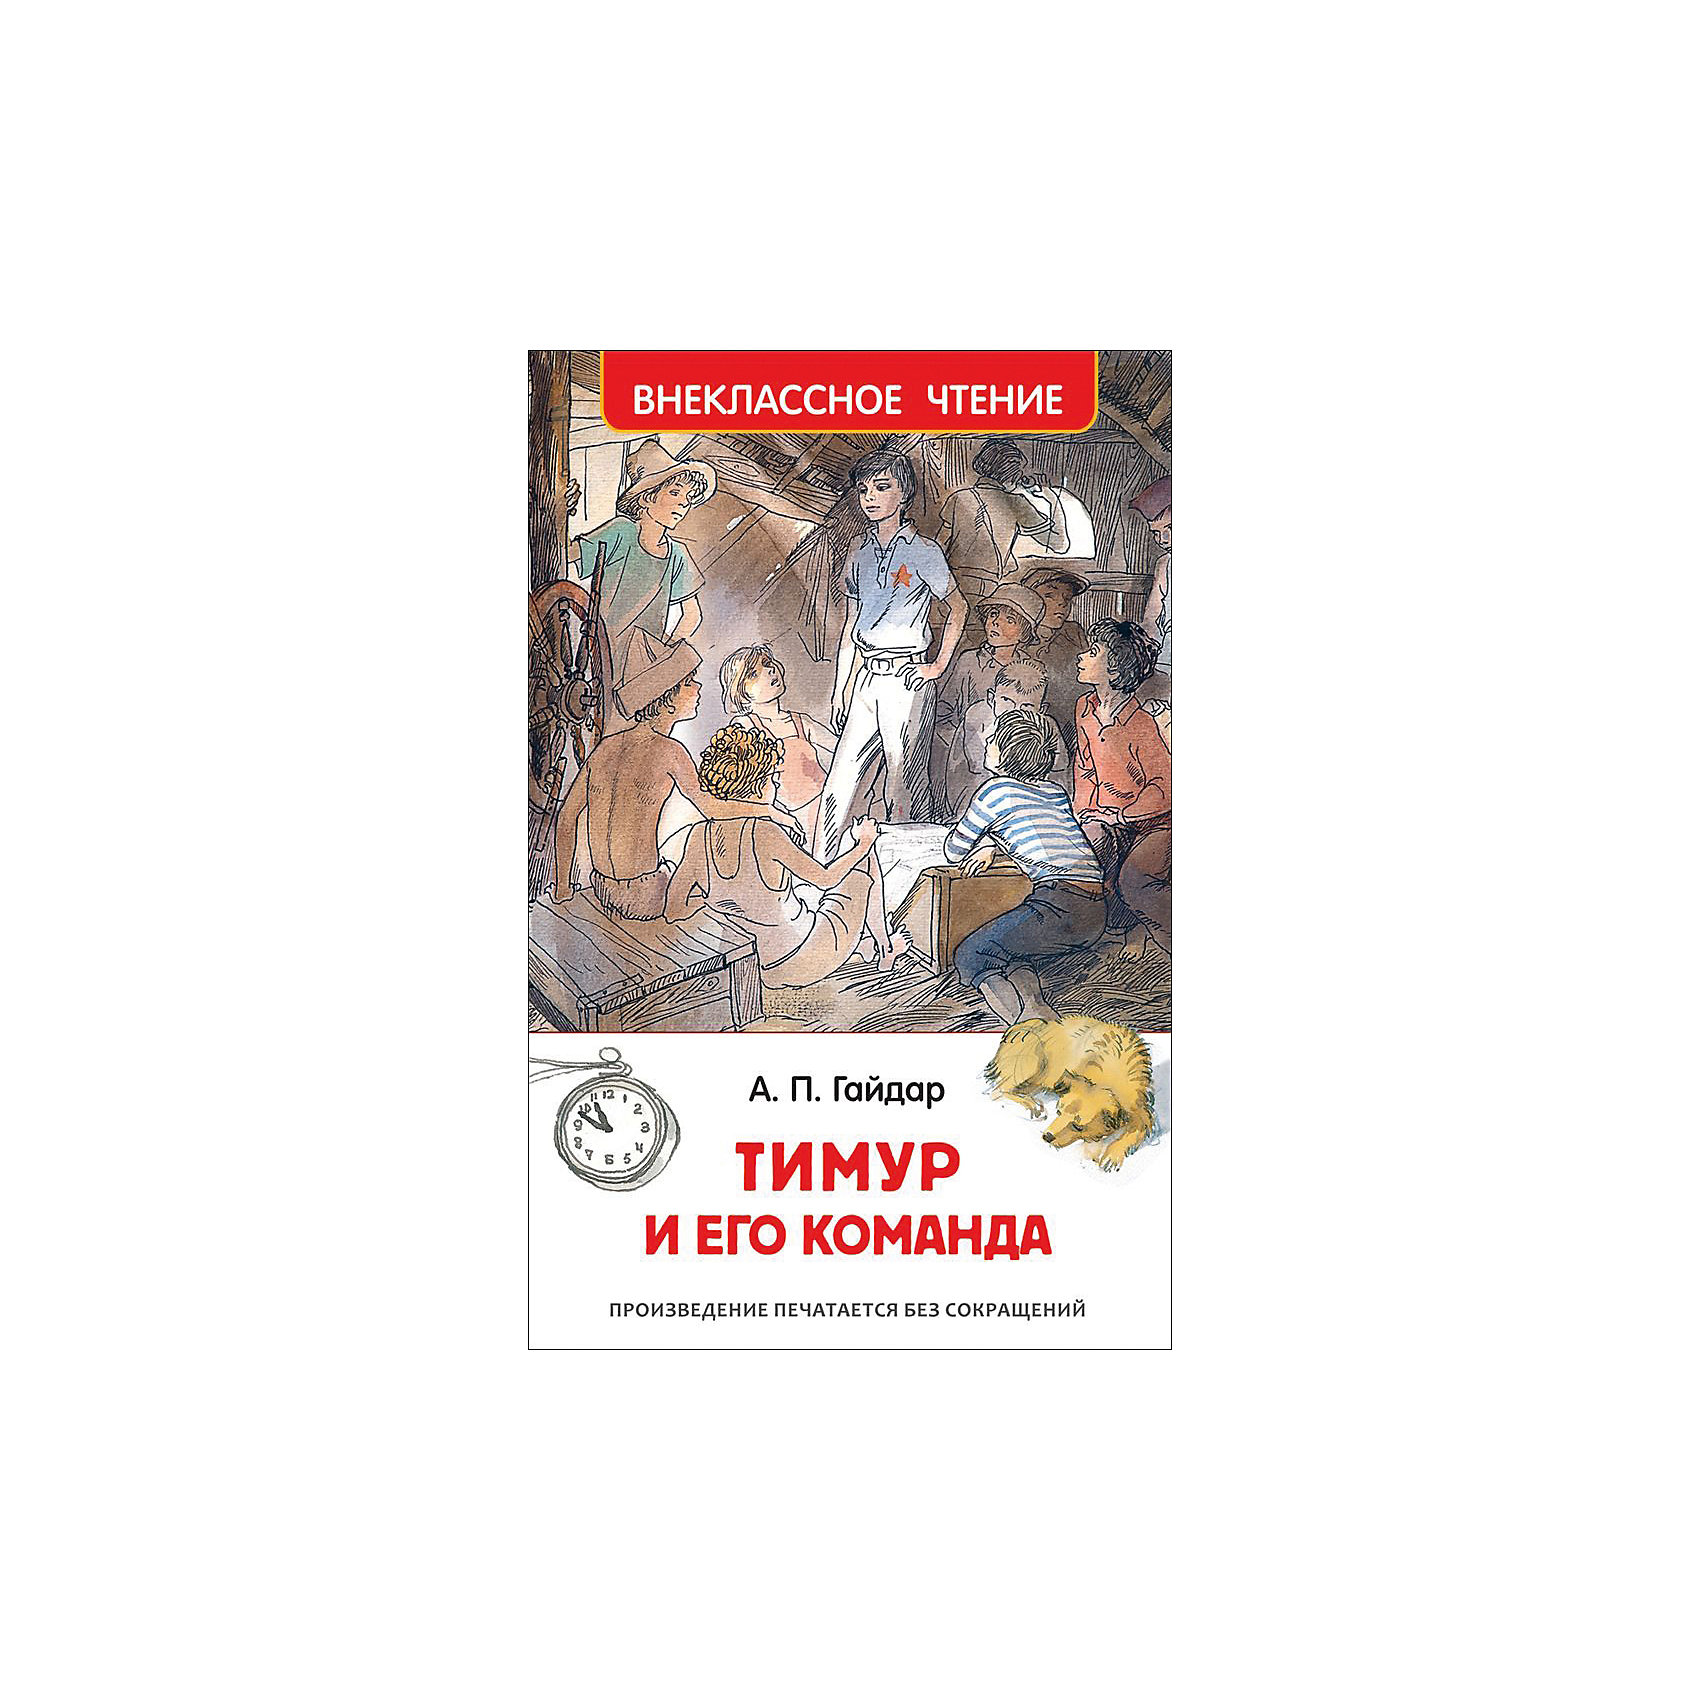 Росмэн Тимур и его команда, А. Гайдар аркадий гайдар наблюдатель